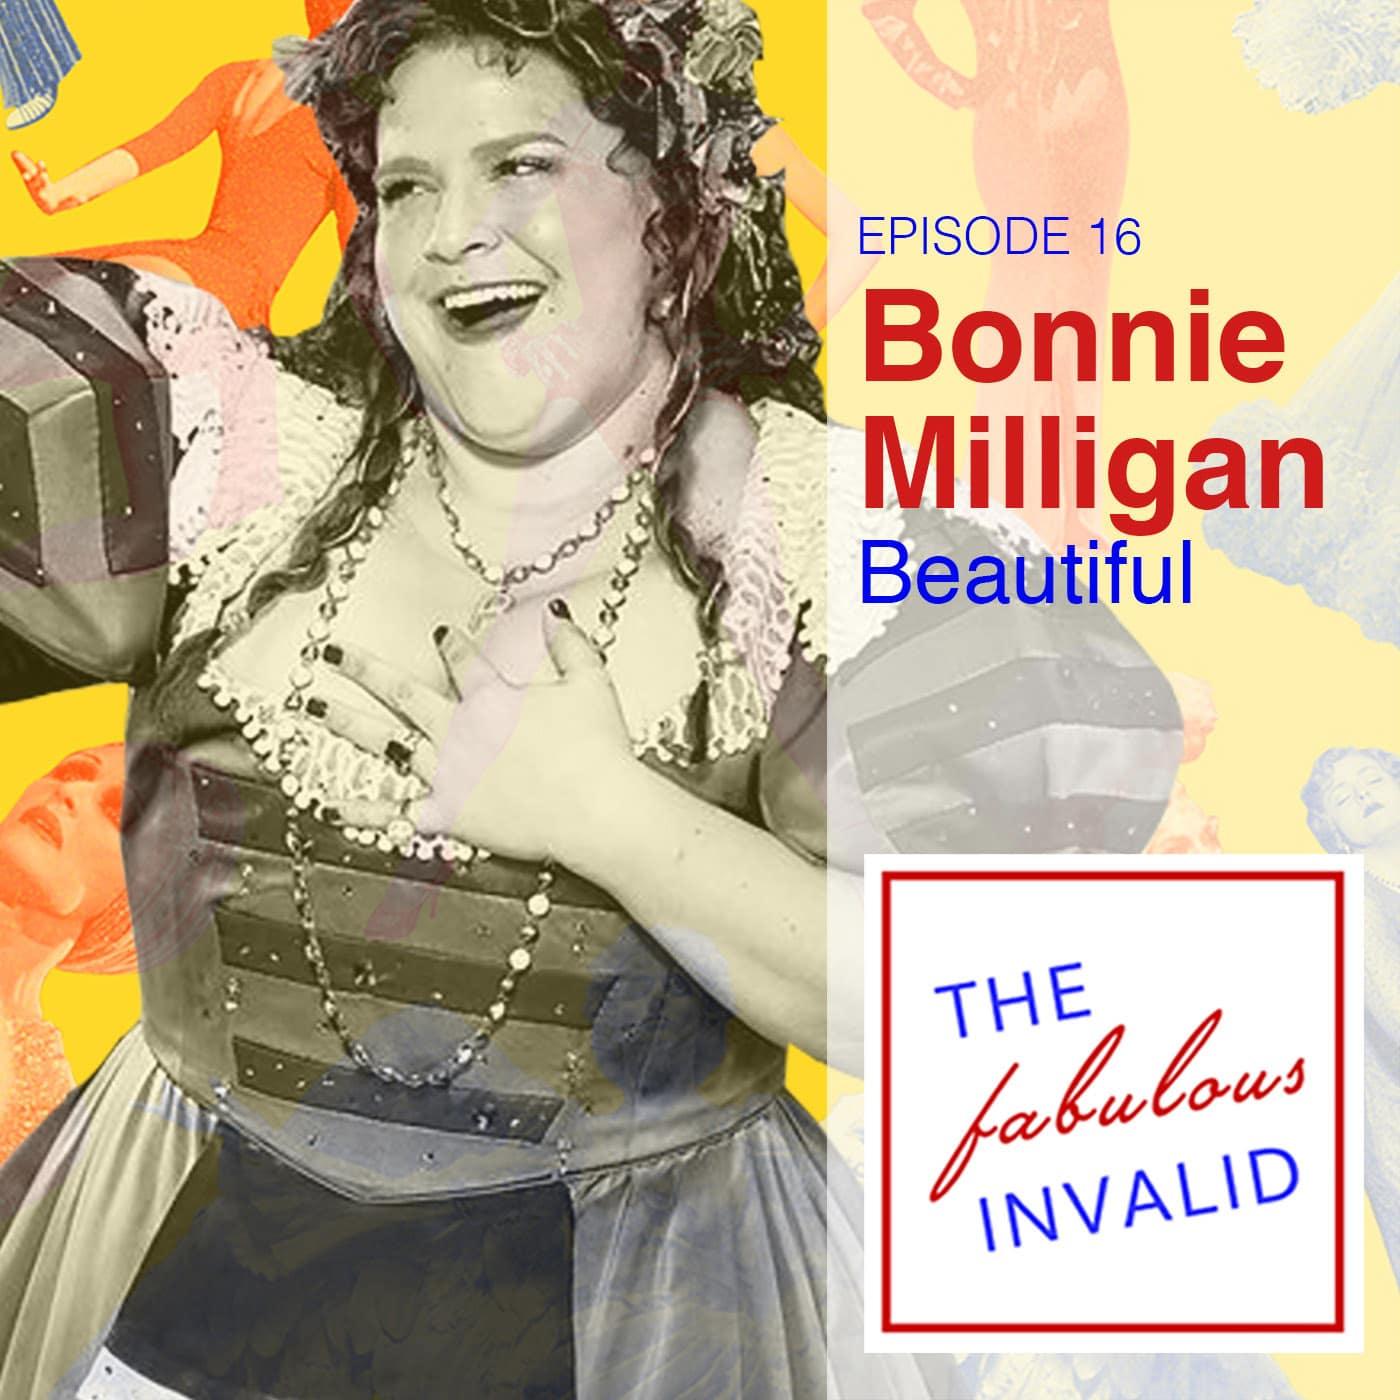 The Fabulous Invalid Ep 16 Bonnie Milligan